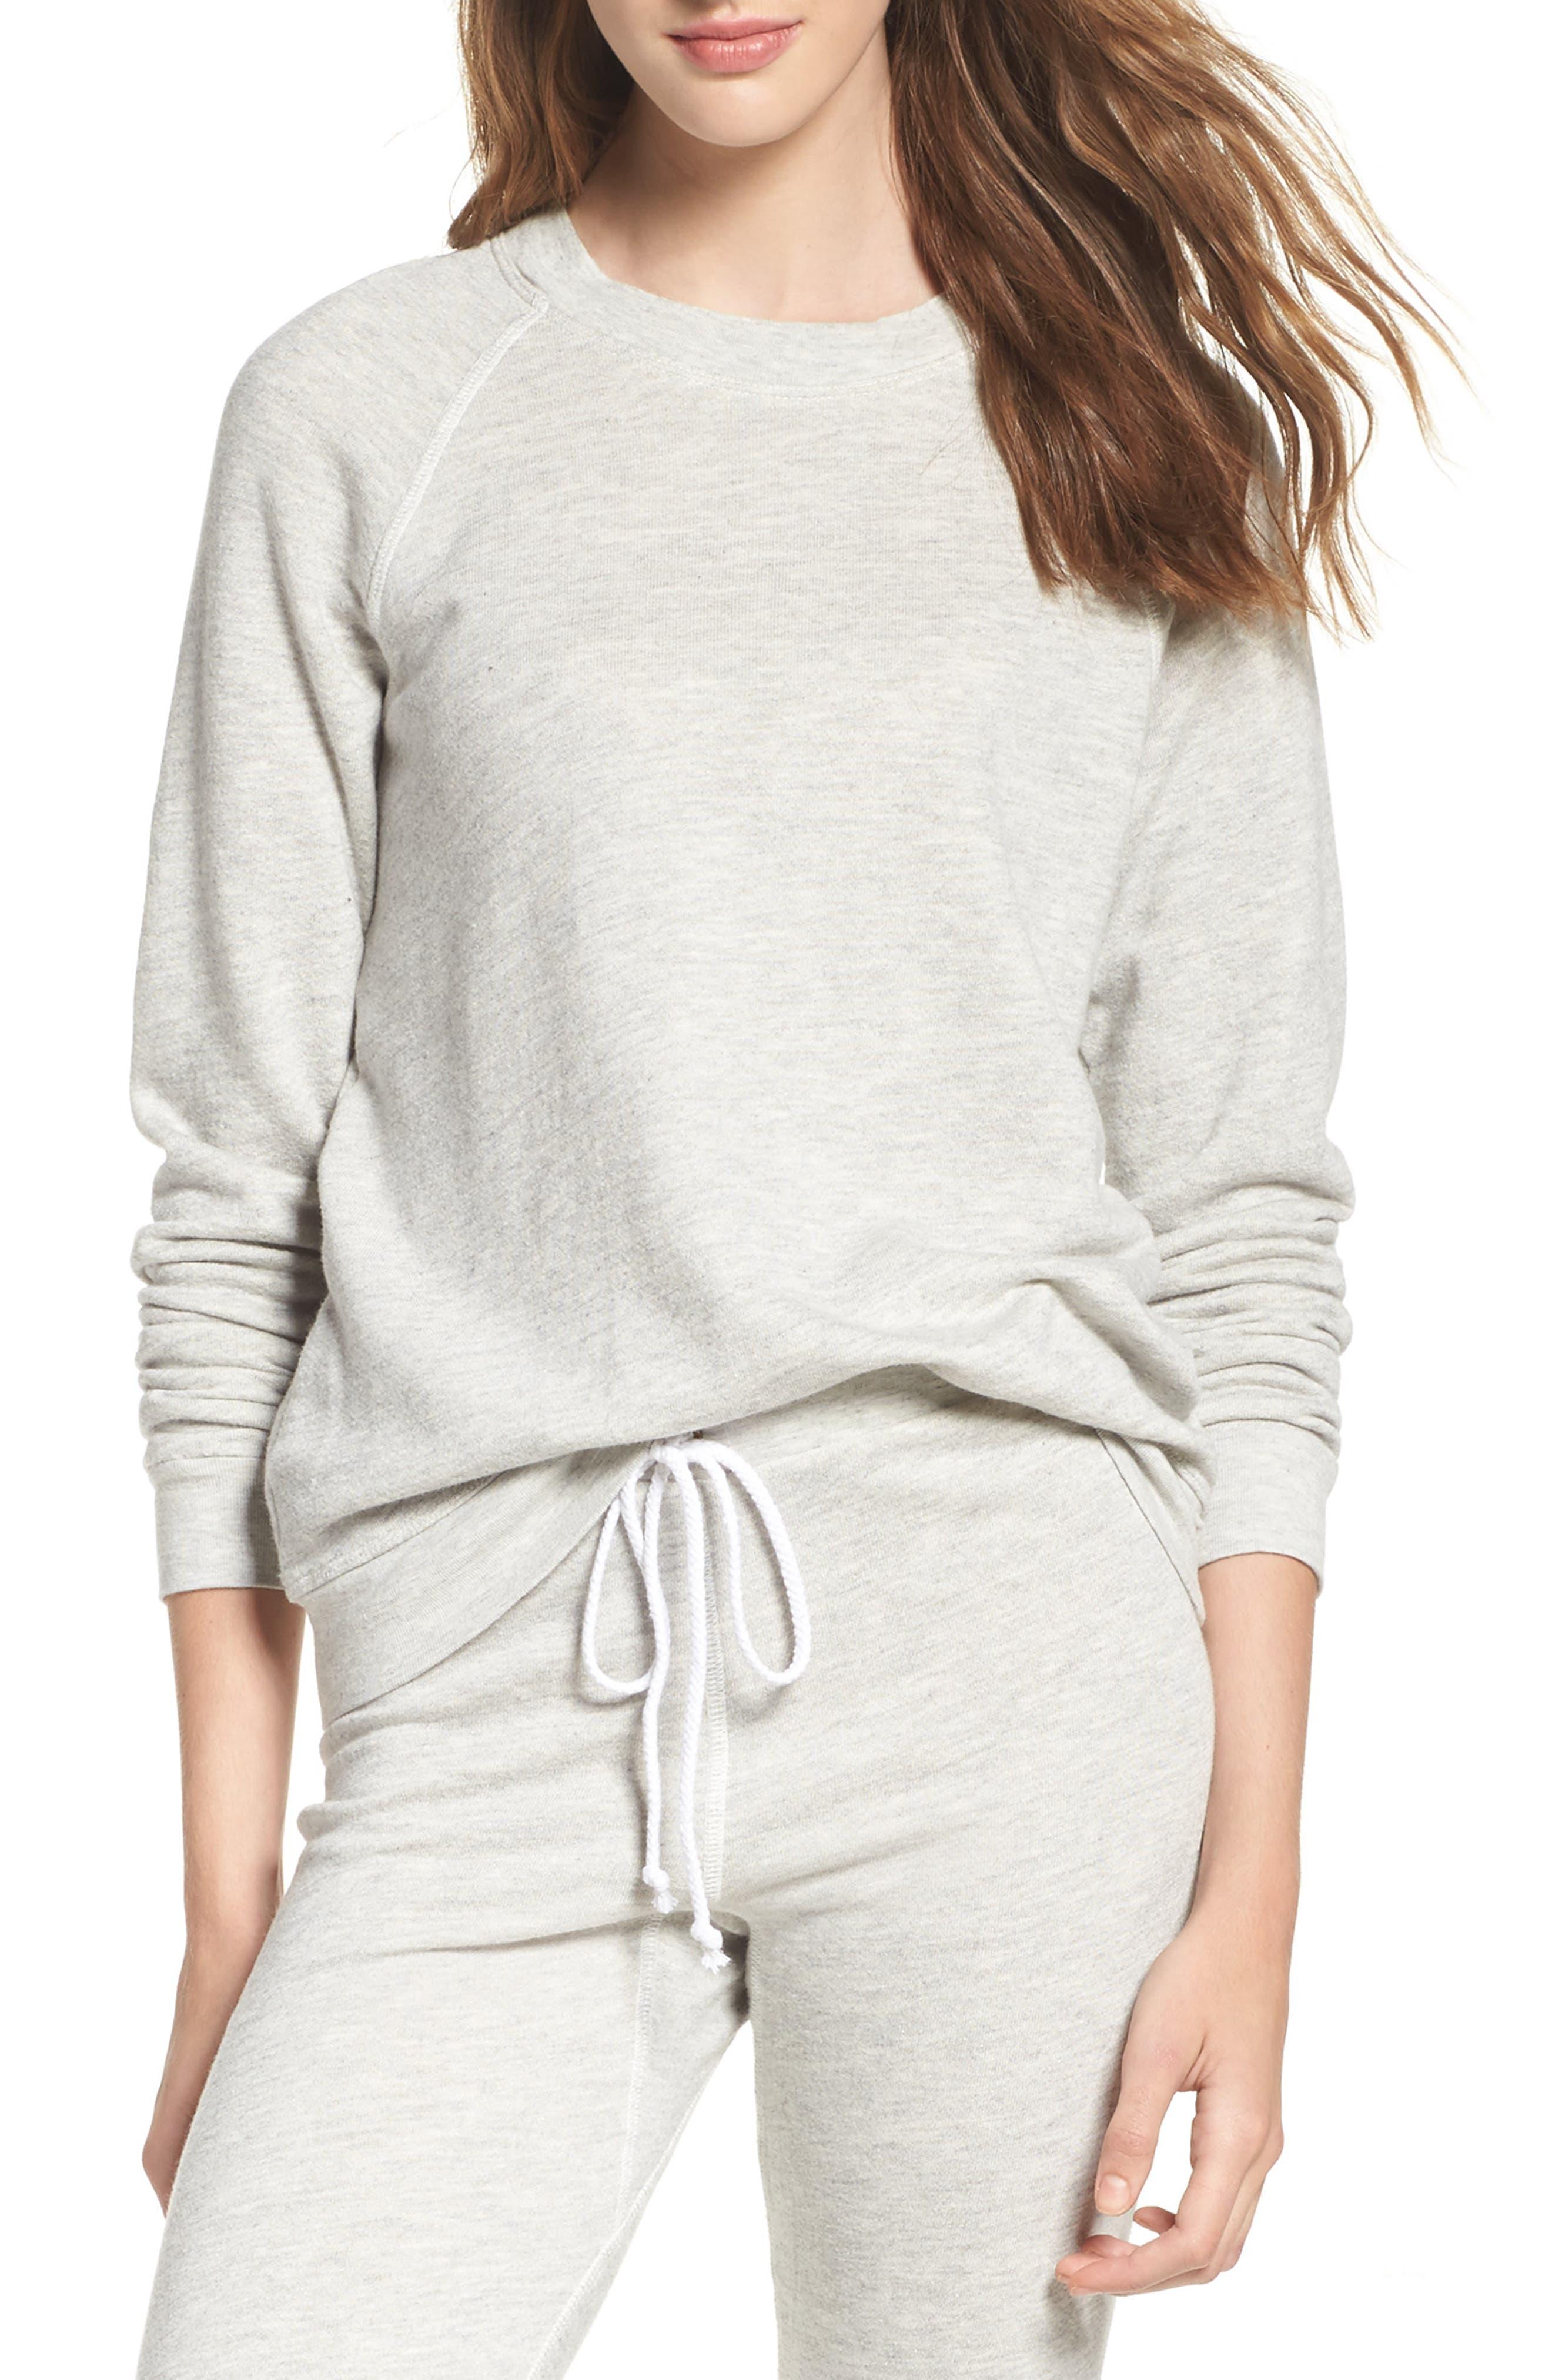 Main Image - LACAUSA Favorite Sweatshirt